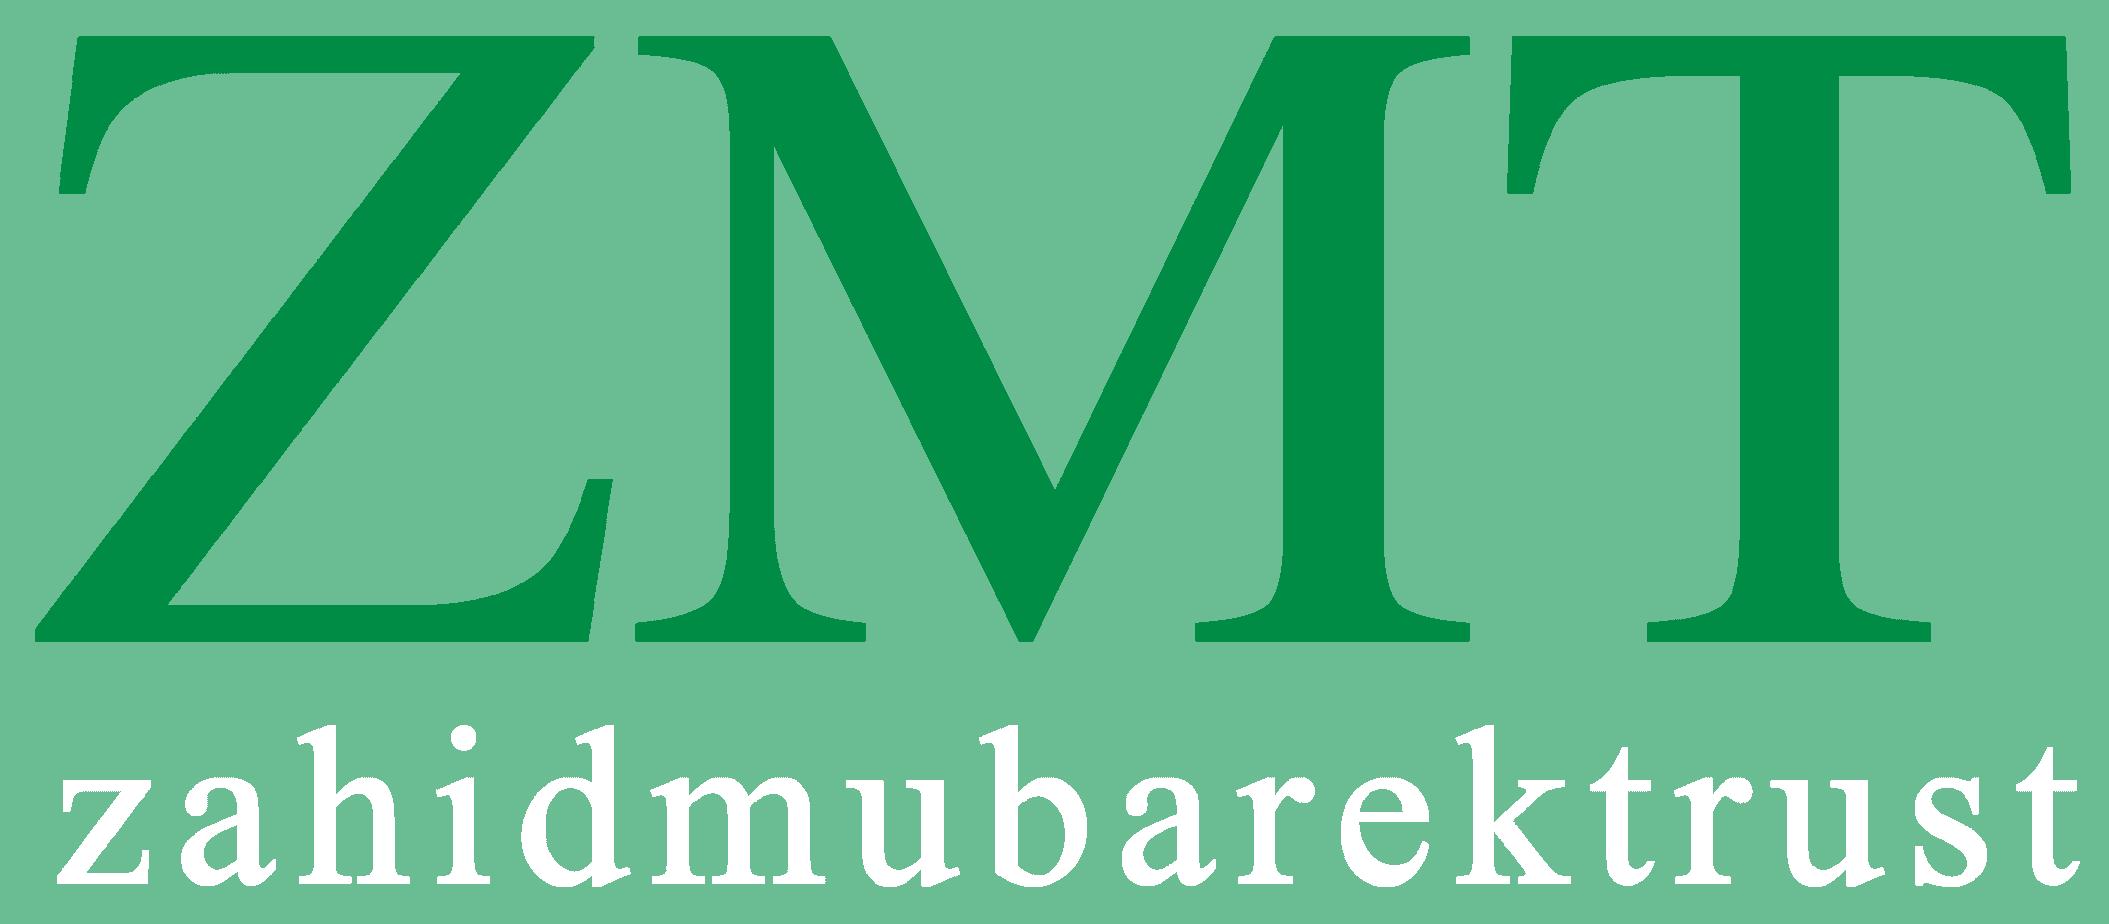 Zahid Mubarek Trust